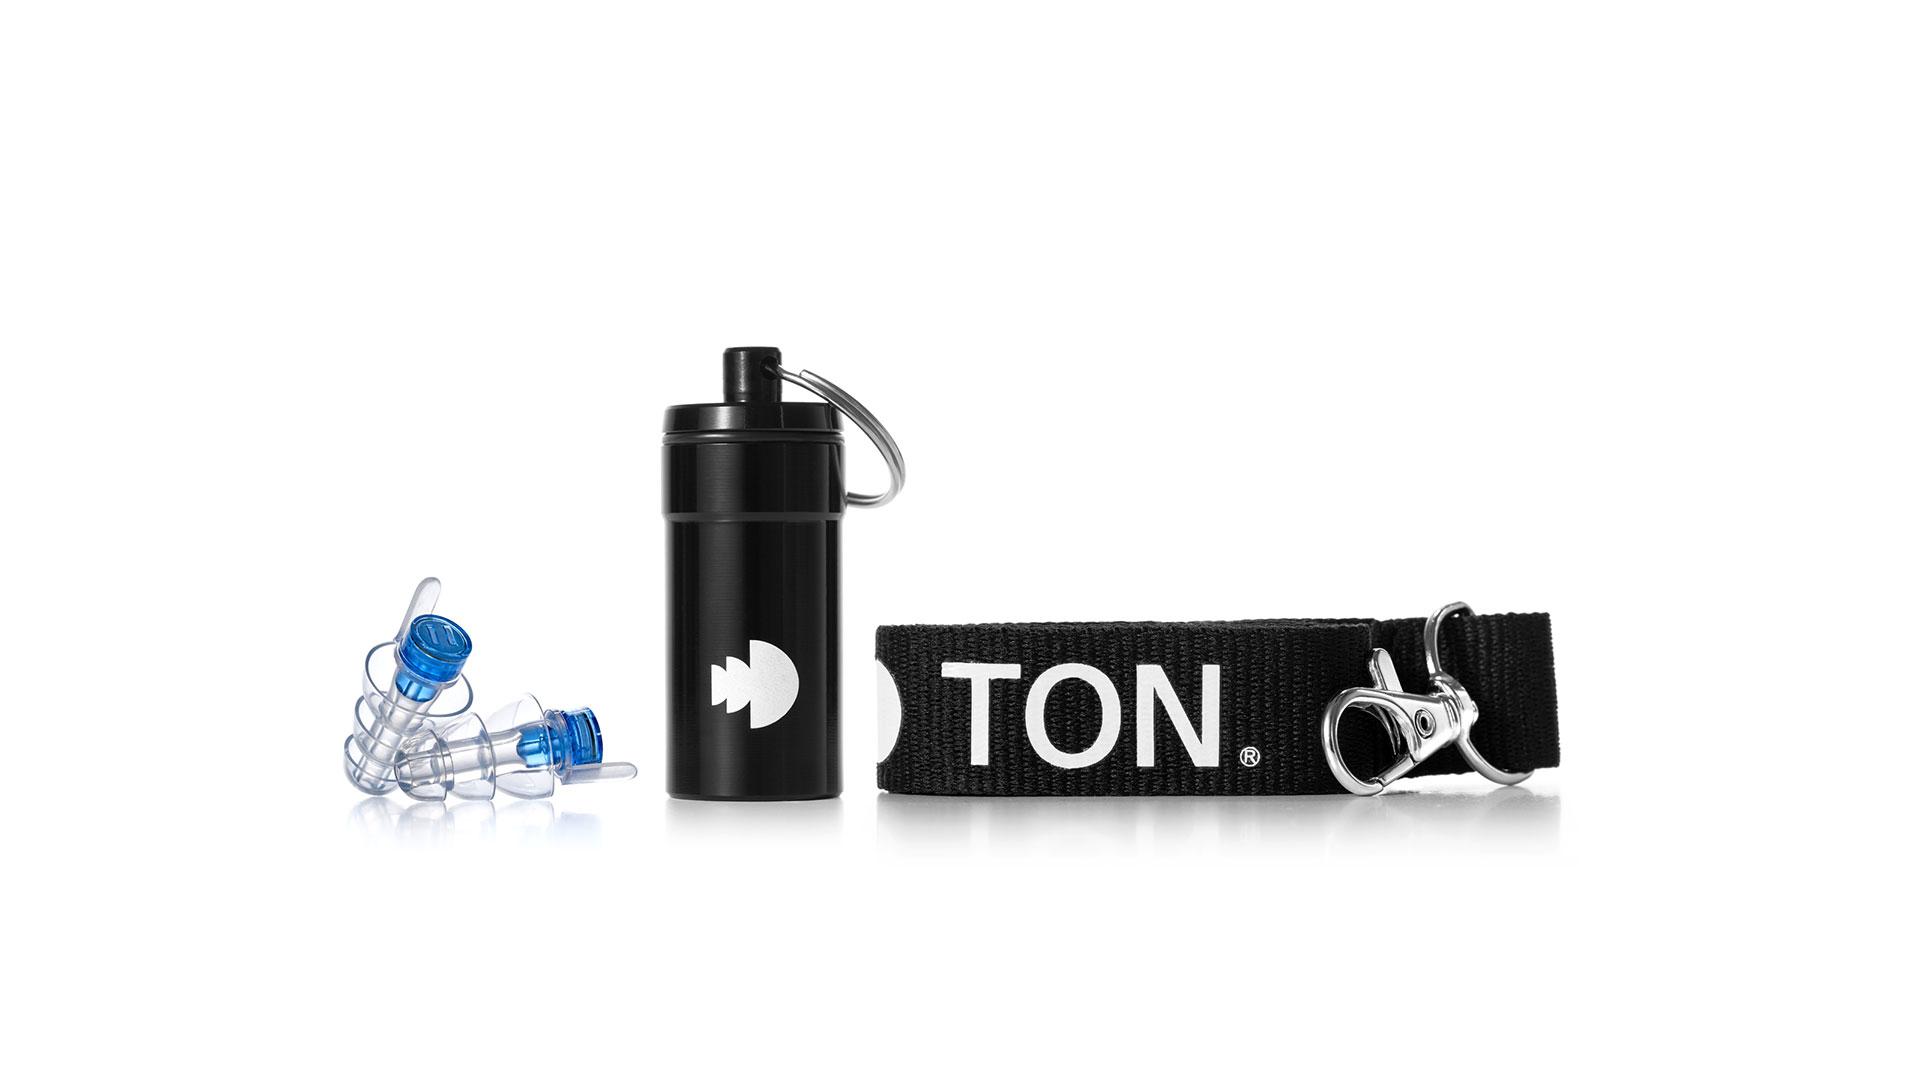 ton_branding_4